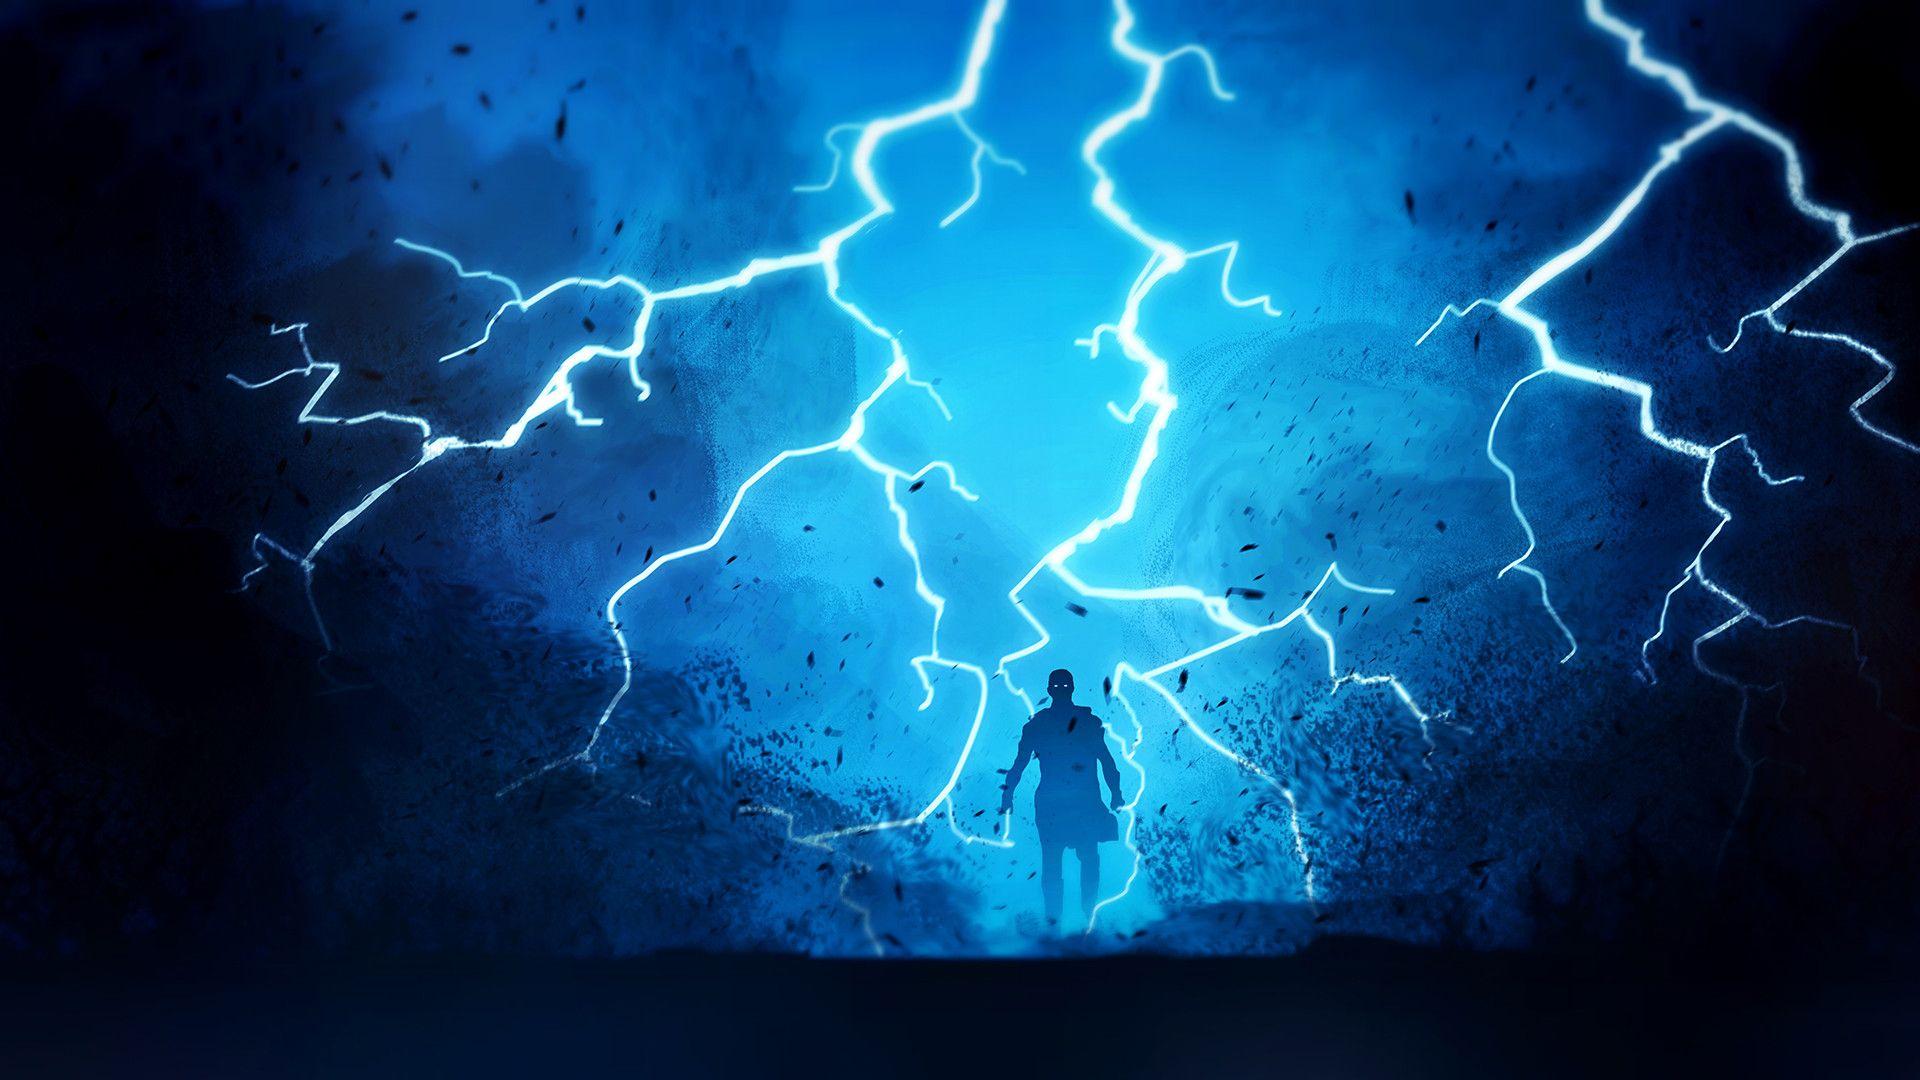 24 Lightning Bolt Wallpapers Wallpaperboat